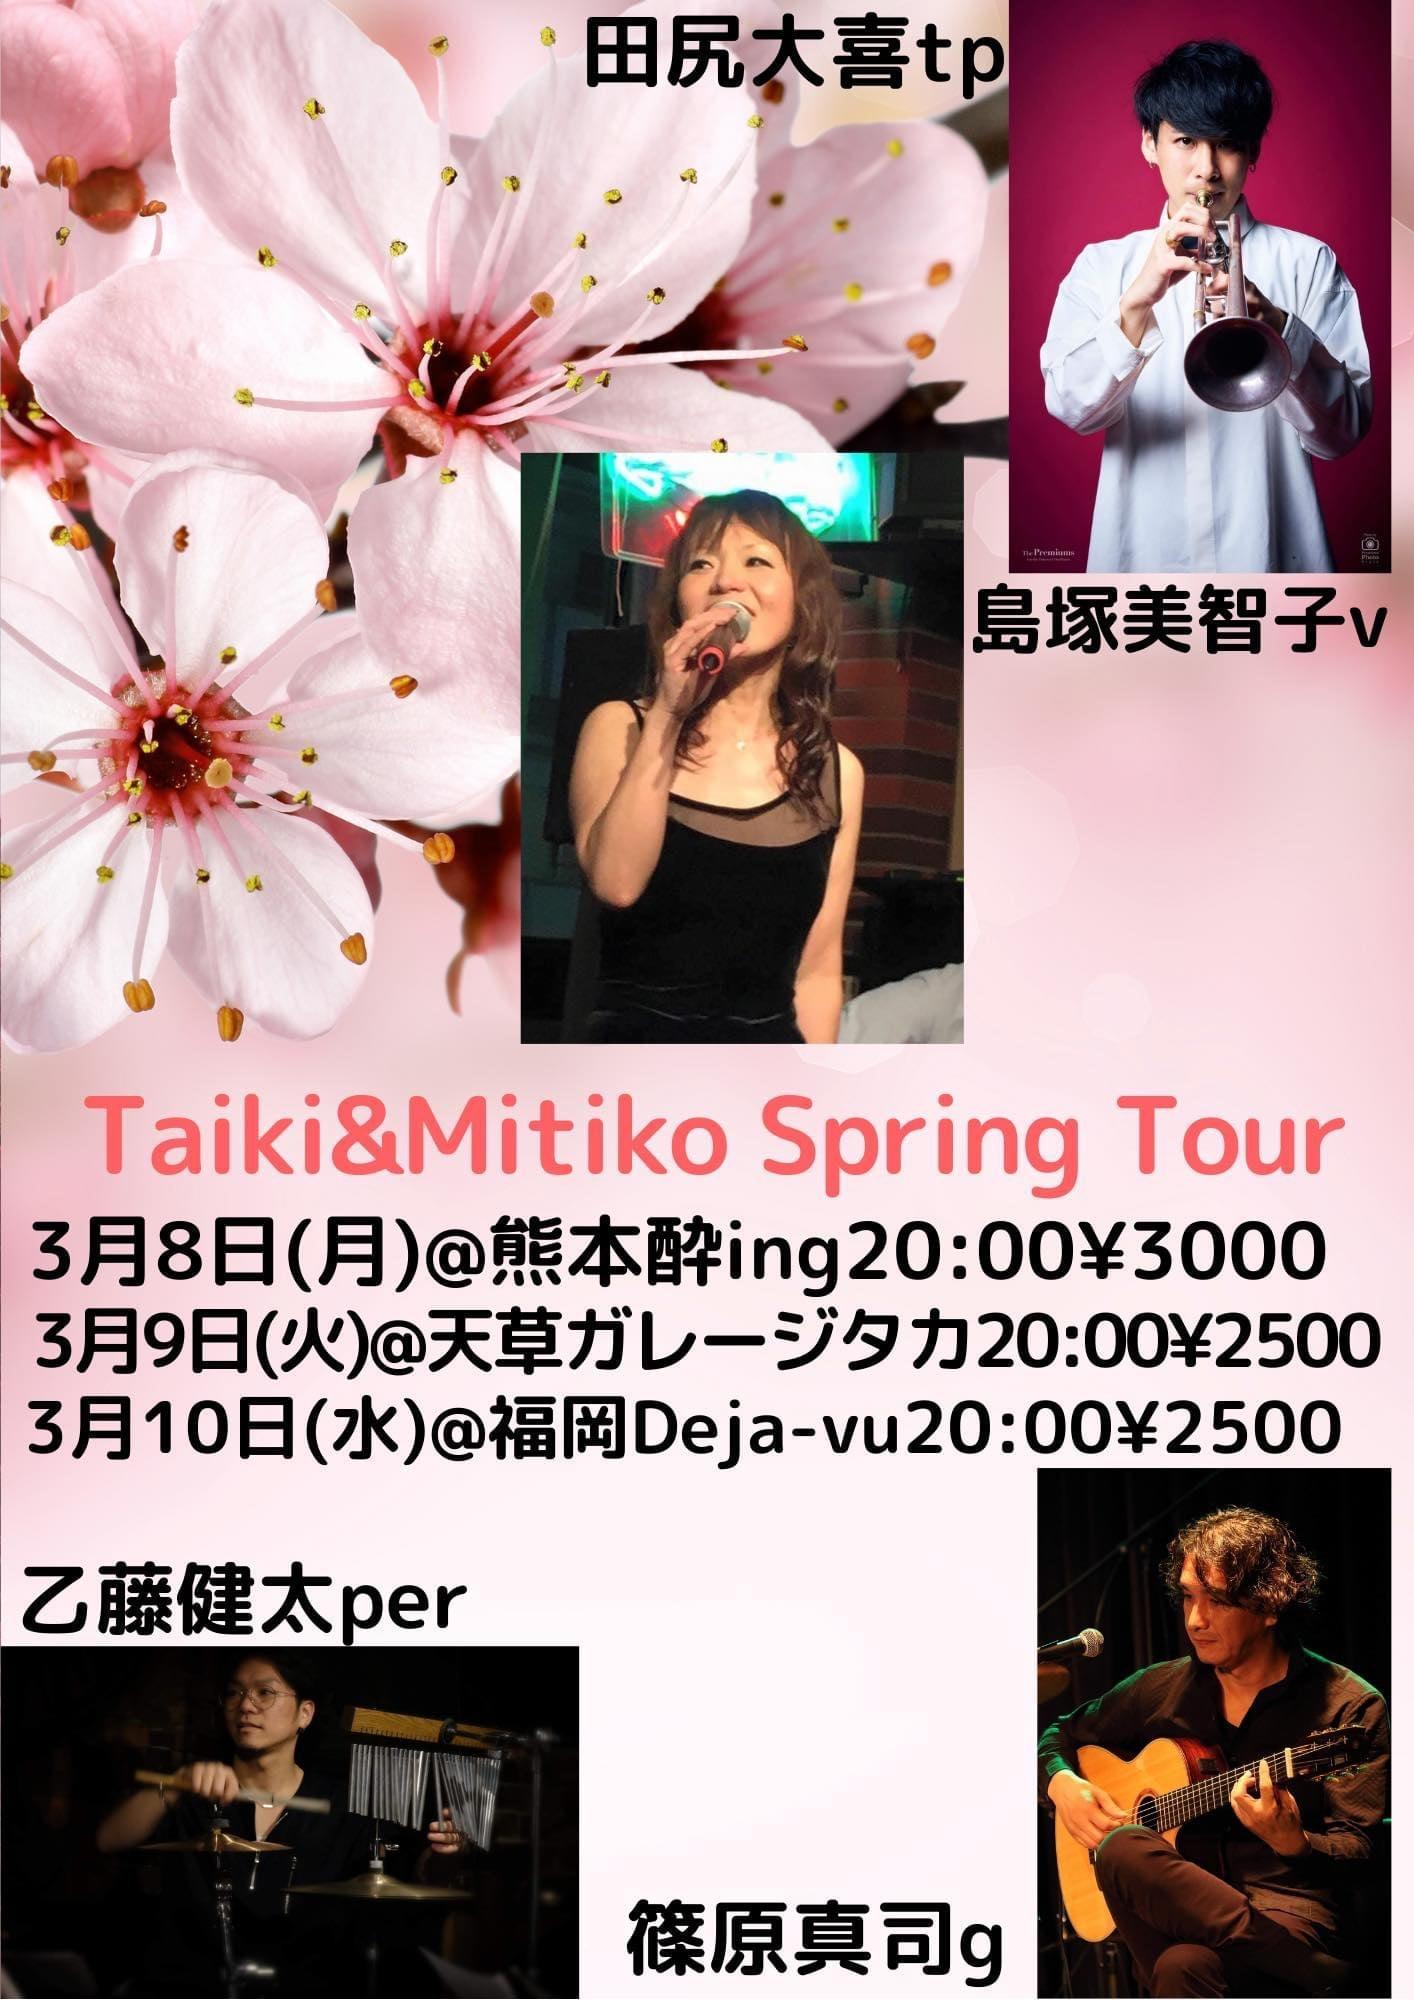 Taiki & Michiko  Spring Tour in Kumamoto